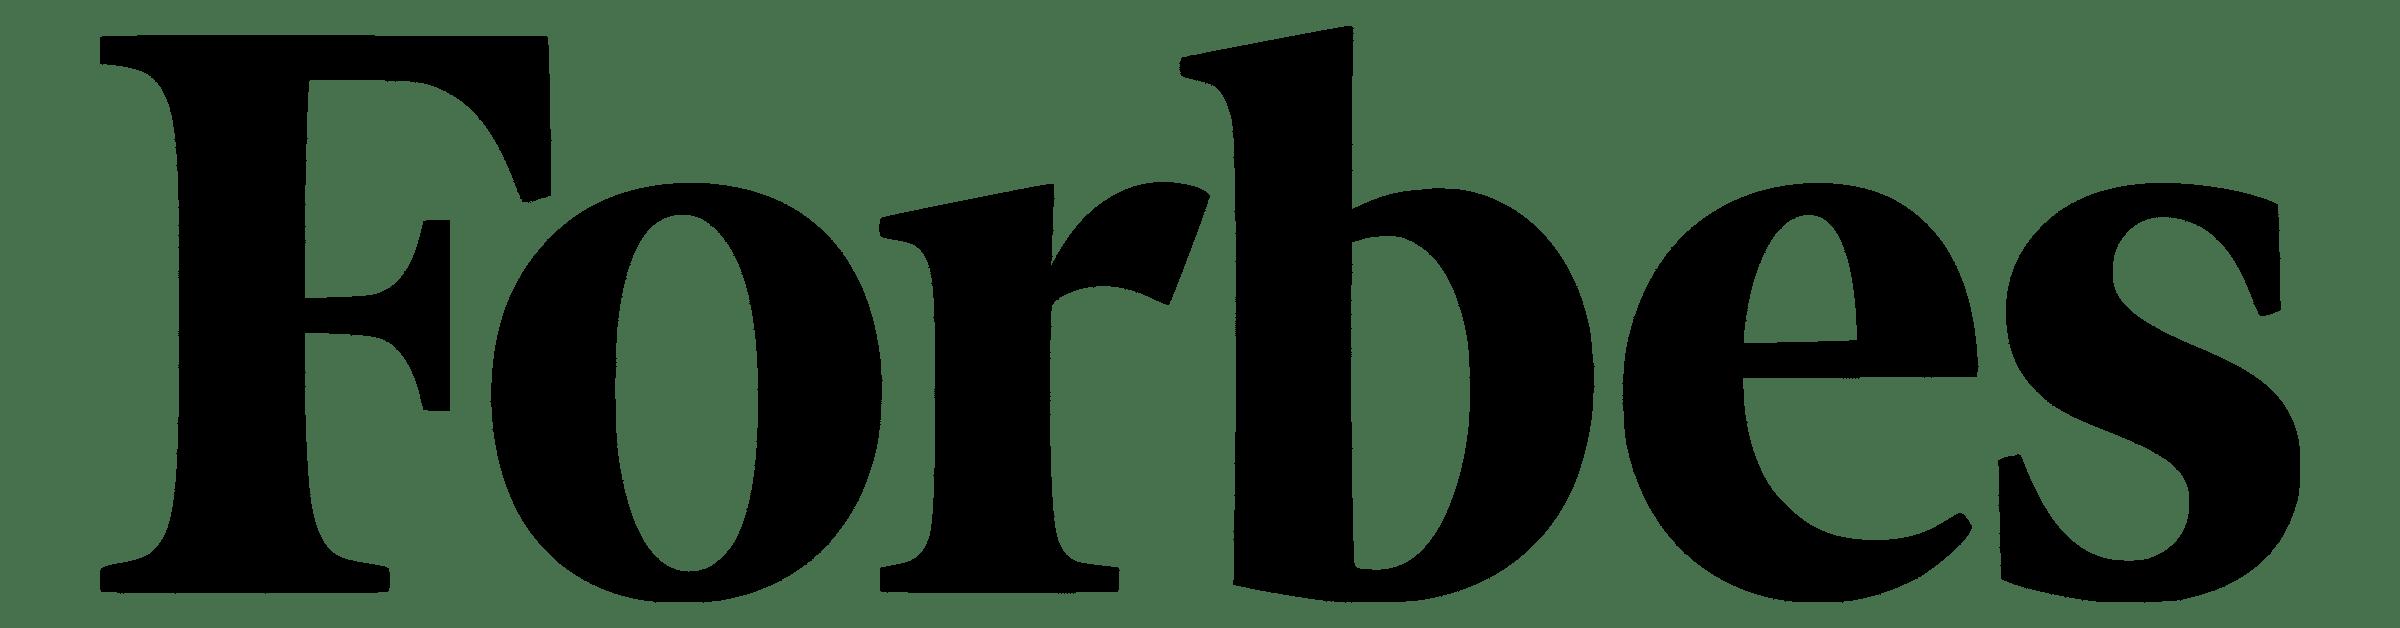 logo-forbes-png-transparent-11